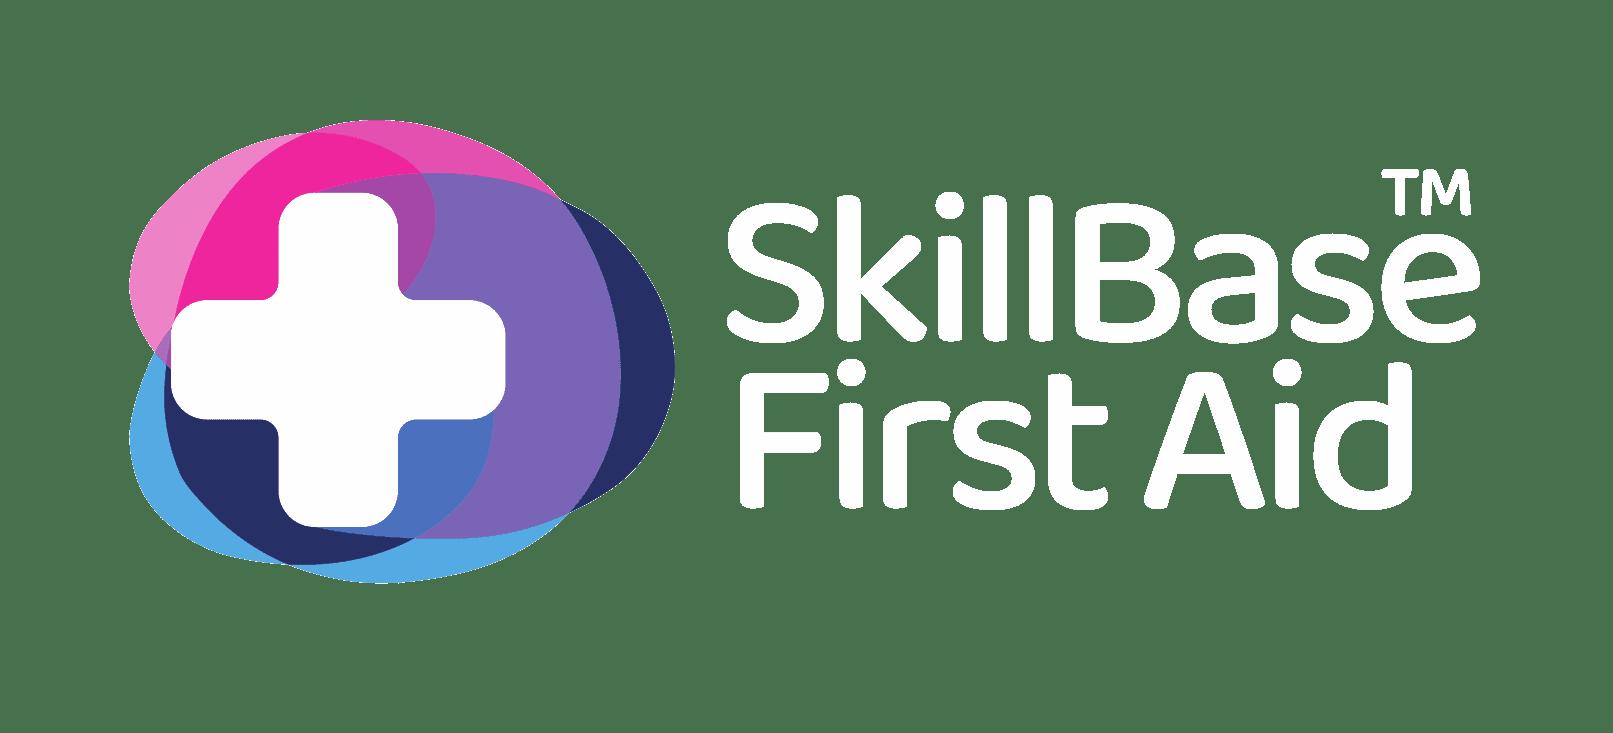 SkillBase First Aid